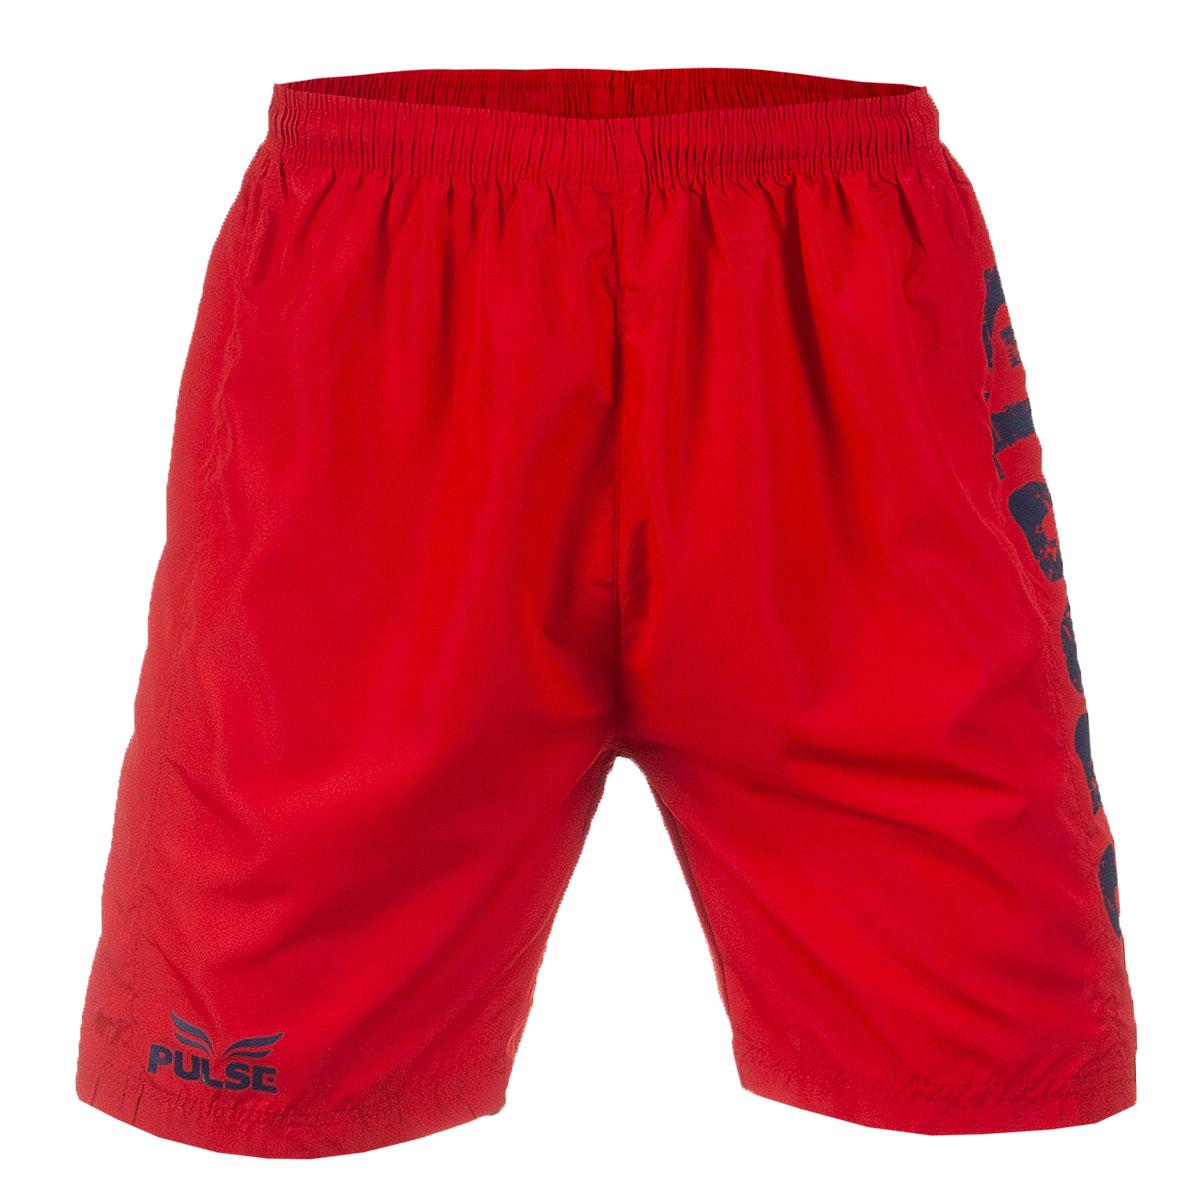 Bermuda Masc. Pulse Sports Casual - Vermelho